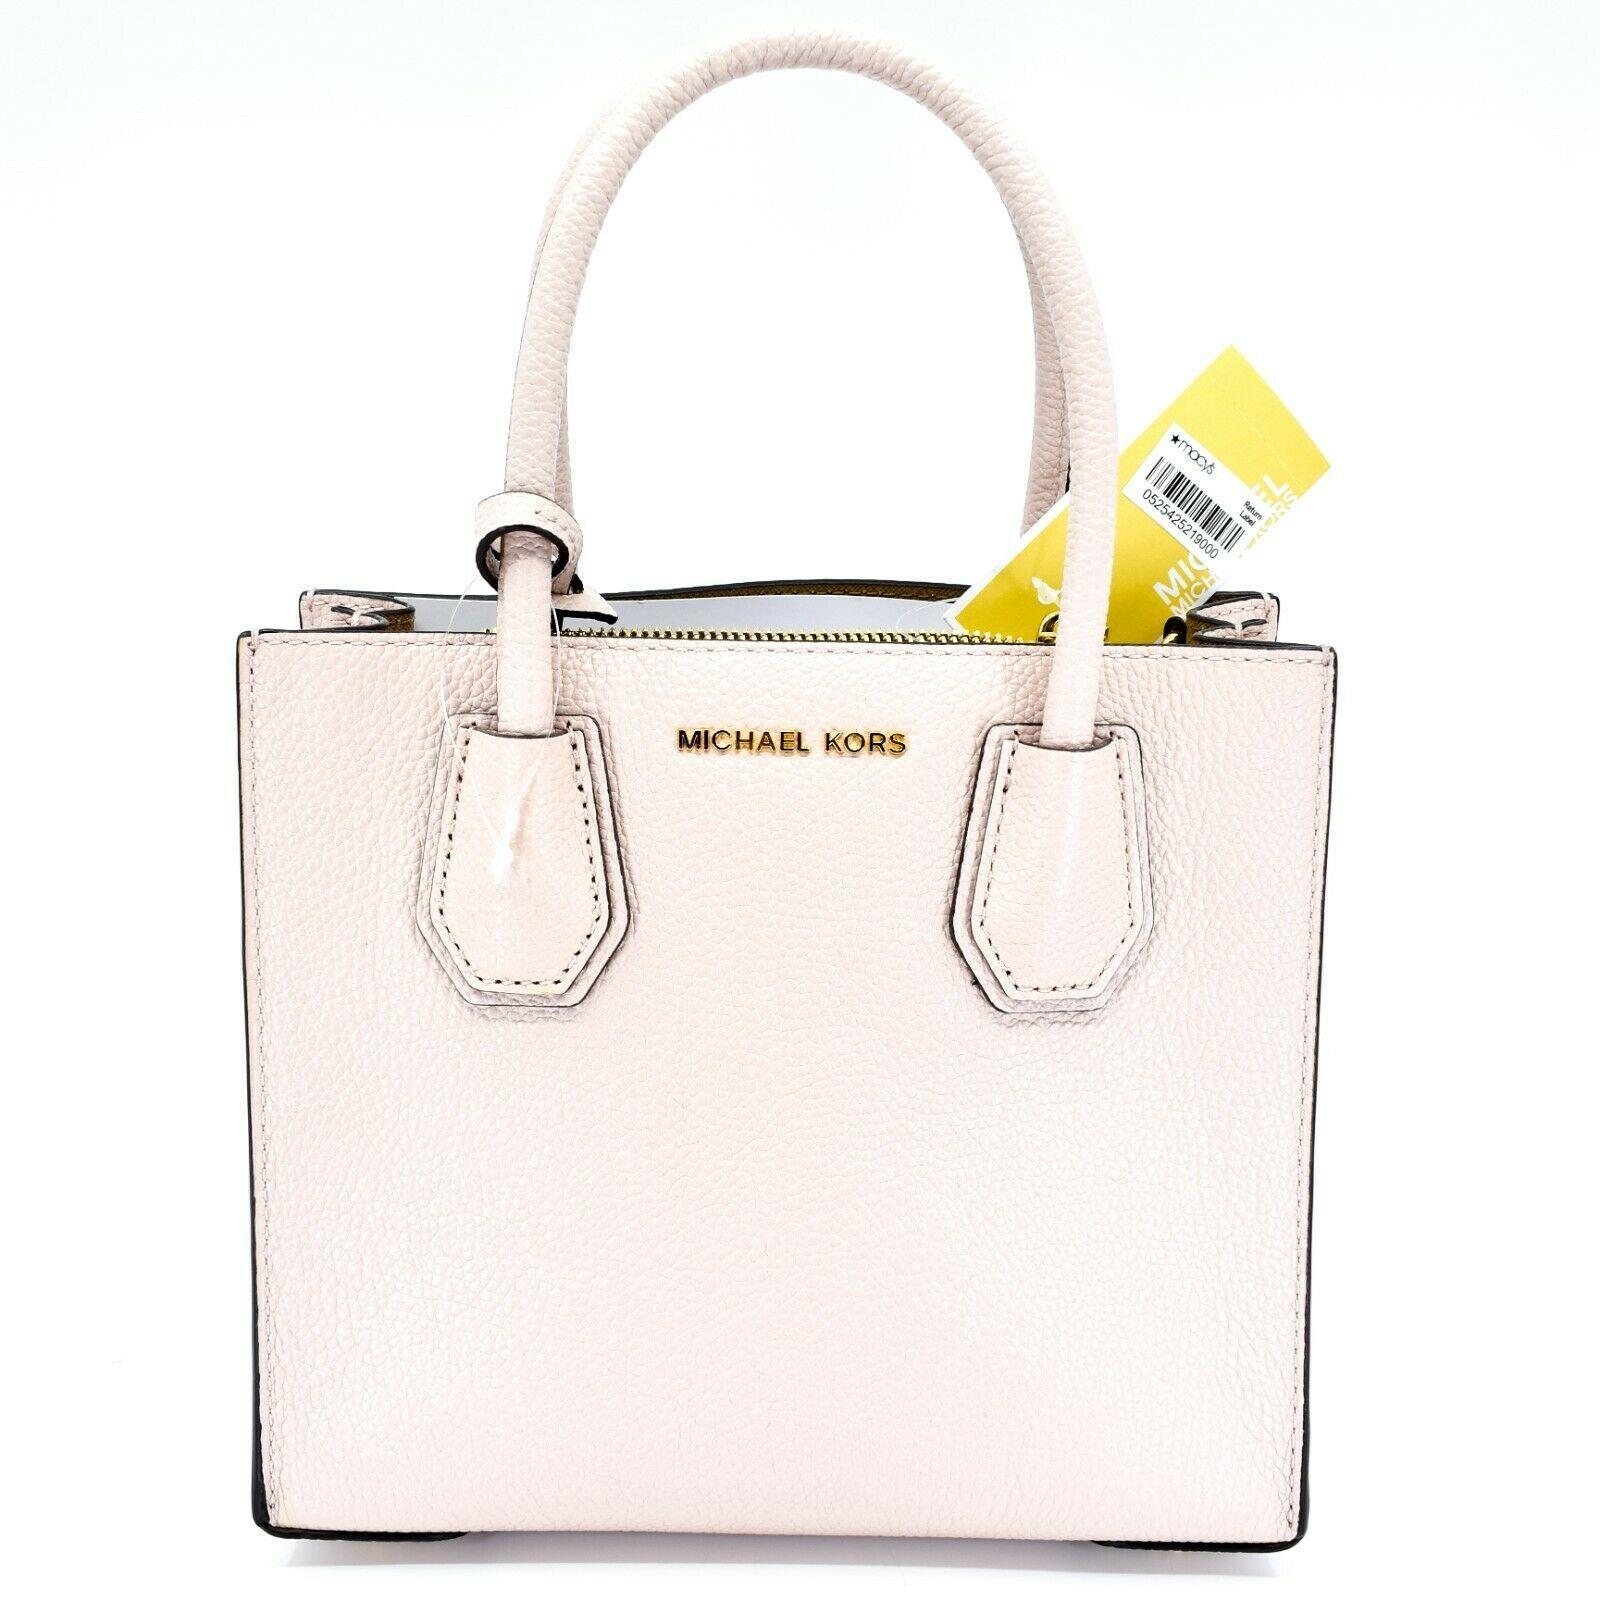 Michael Kors Mercer Soft Pink Pebbled Leather Medium Crossbody Messenger Bag image 2